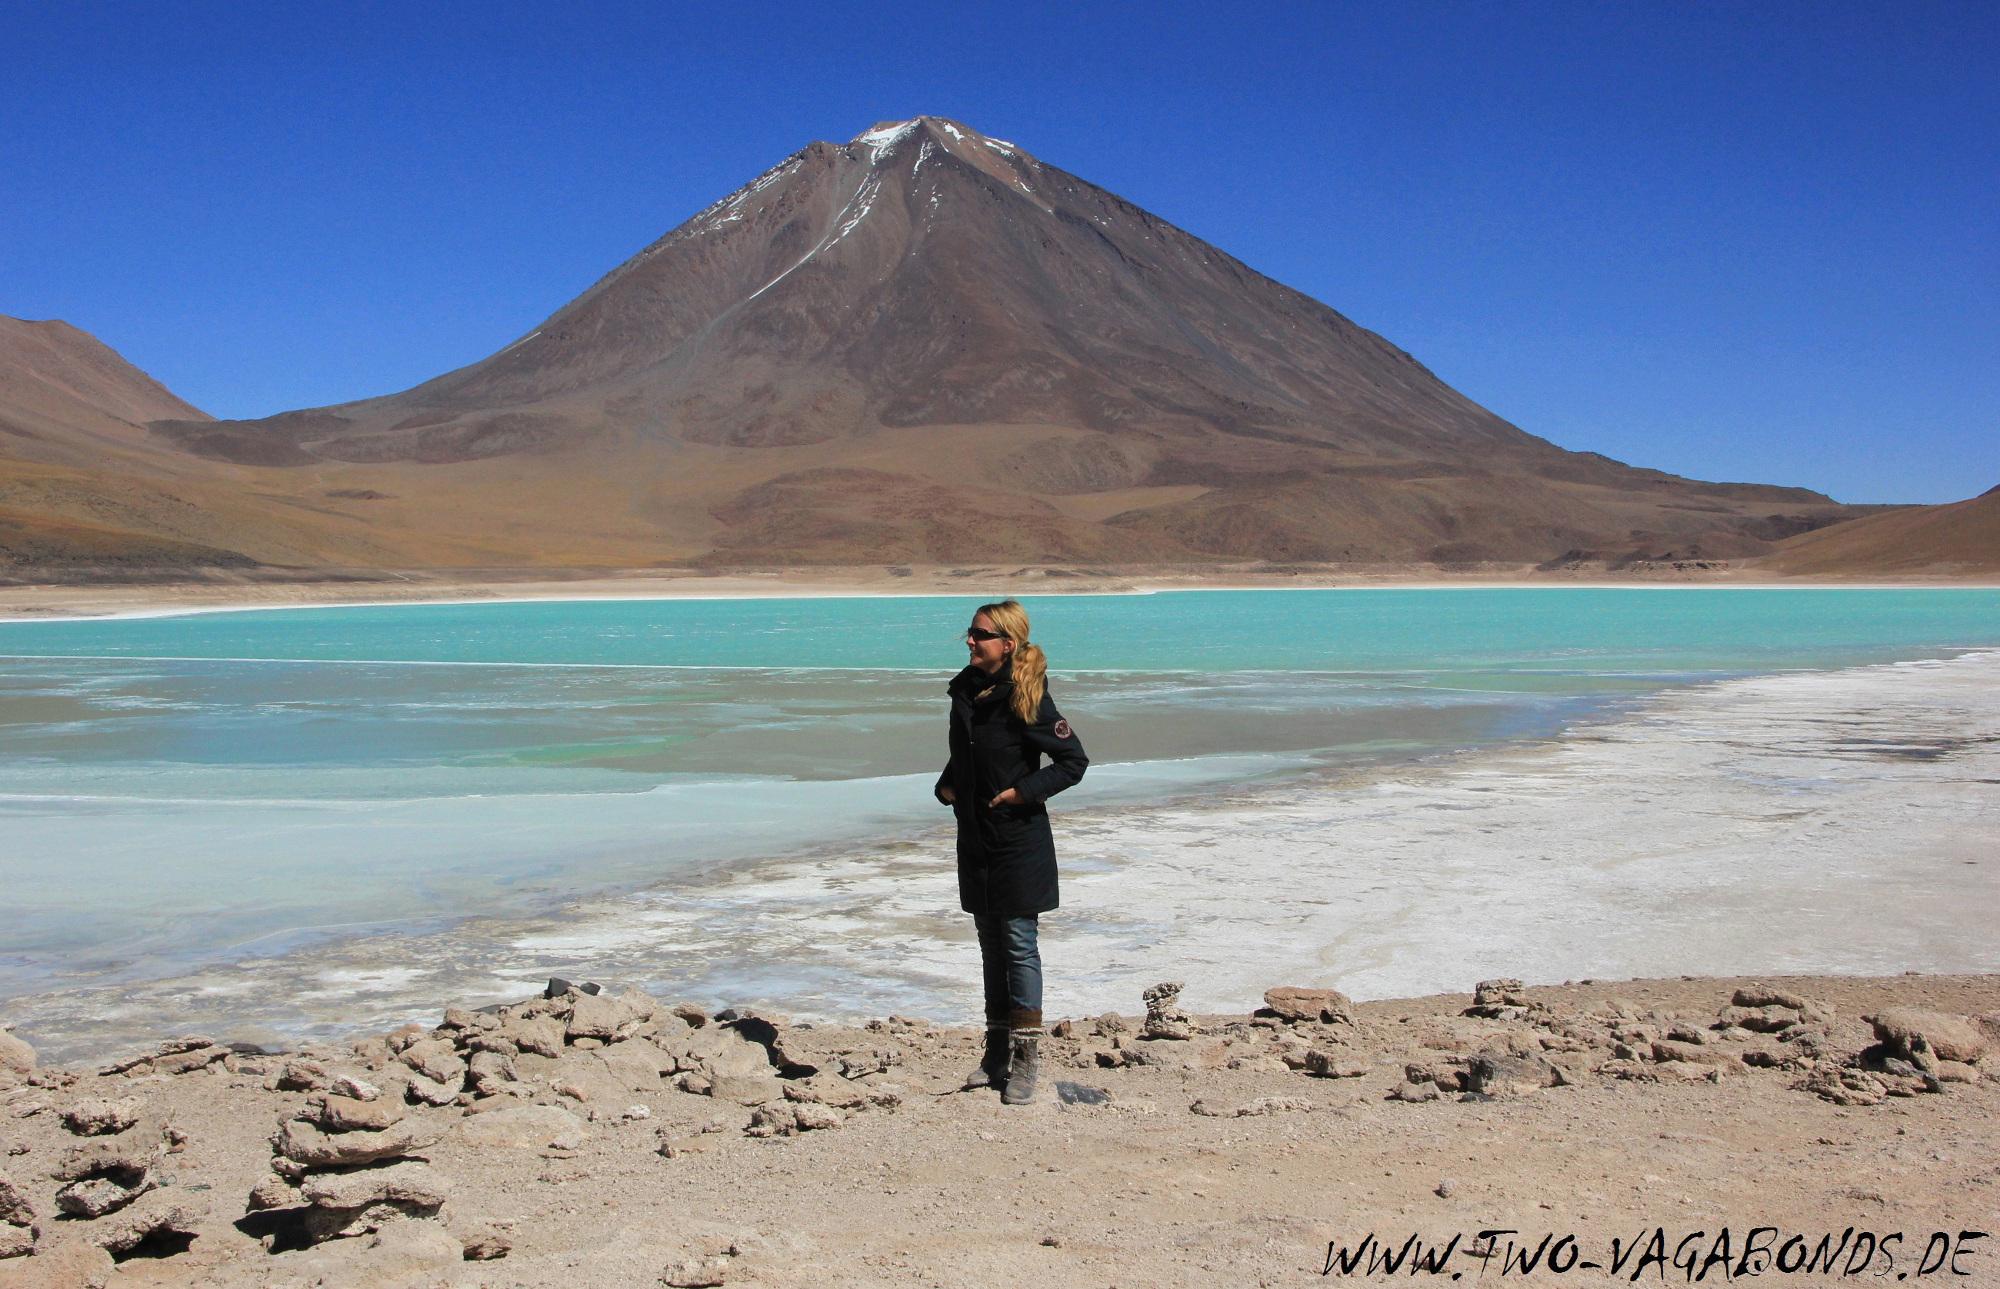 BOLIVIEN 2015 - LAGUNENROUTE - LAGUNA VERDE